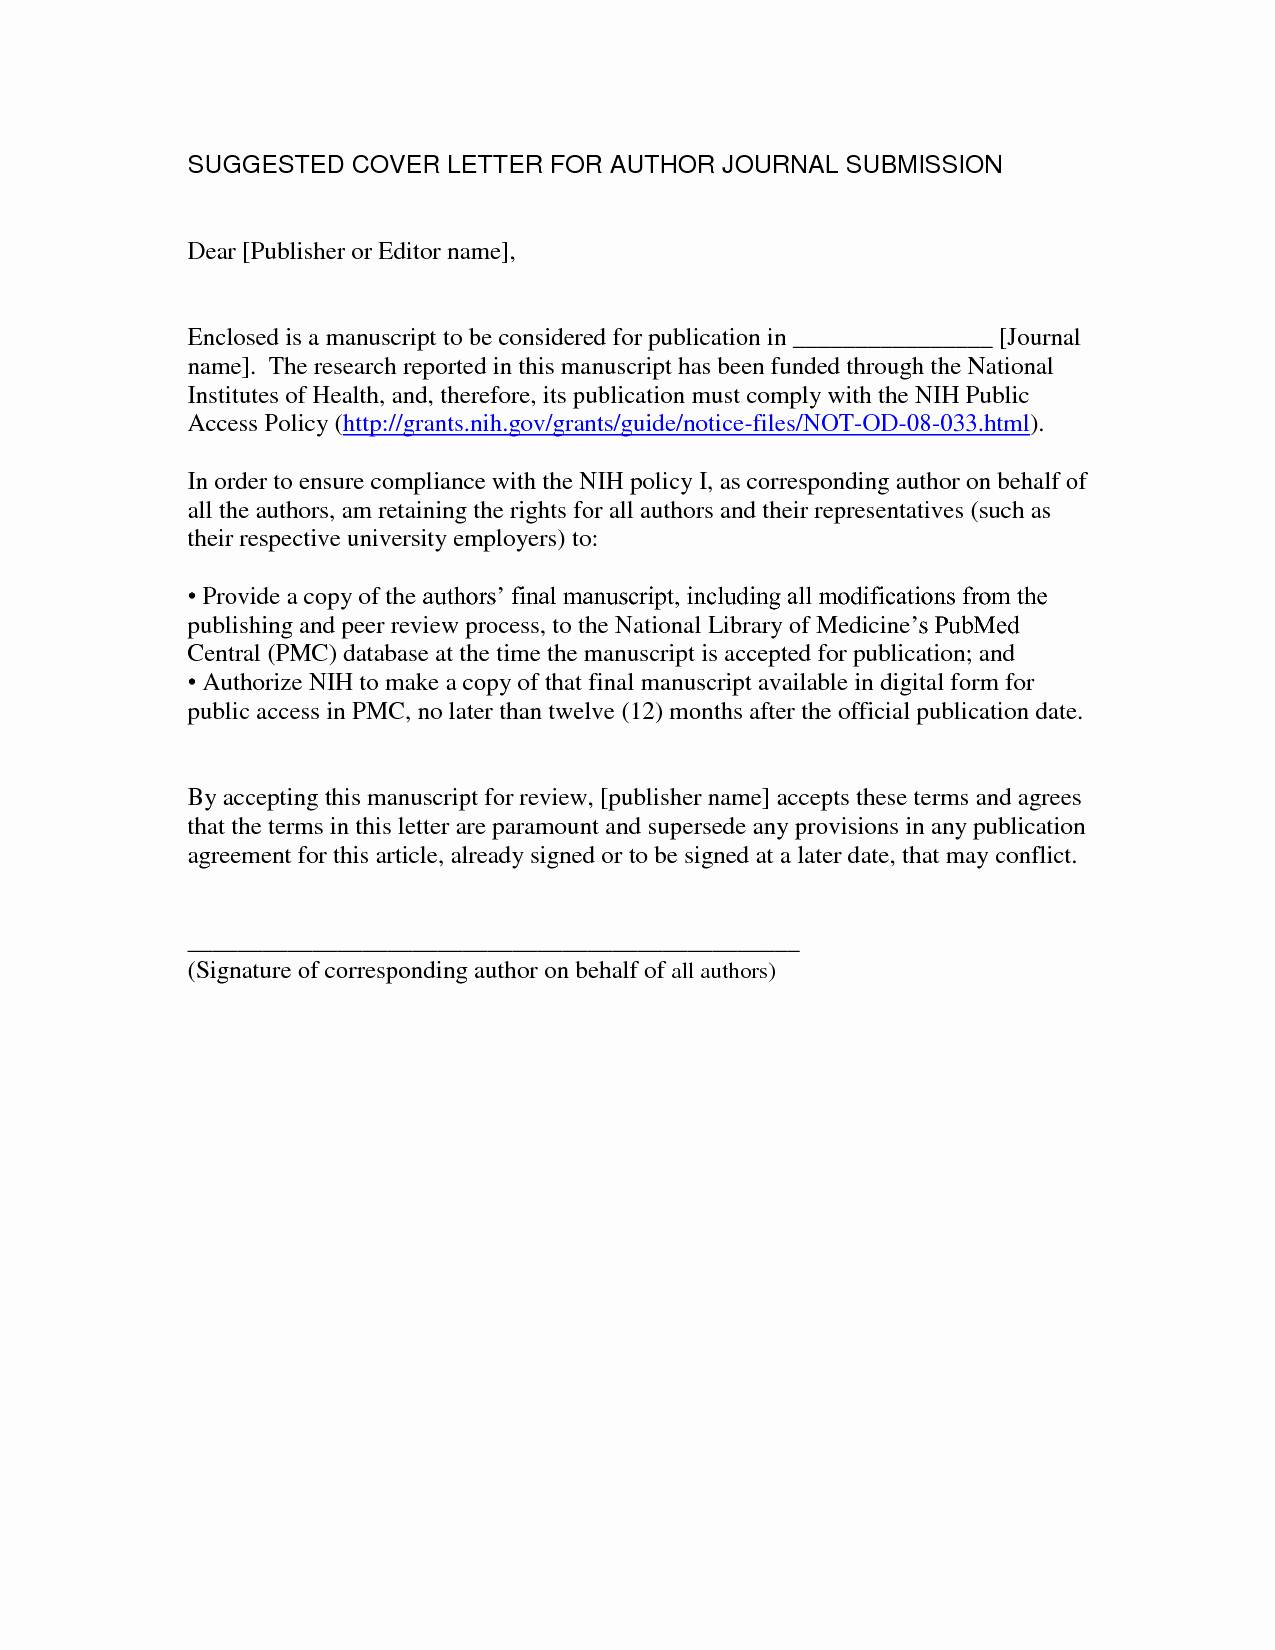 Pdf Cover Letter Template - Pdf Template Creator Unique Cover Letter Templates Free Resume